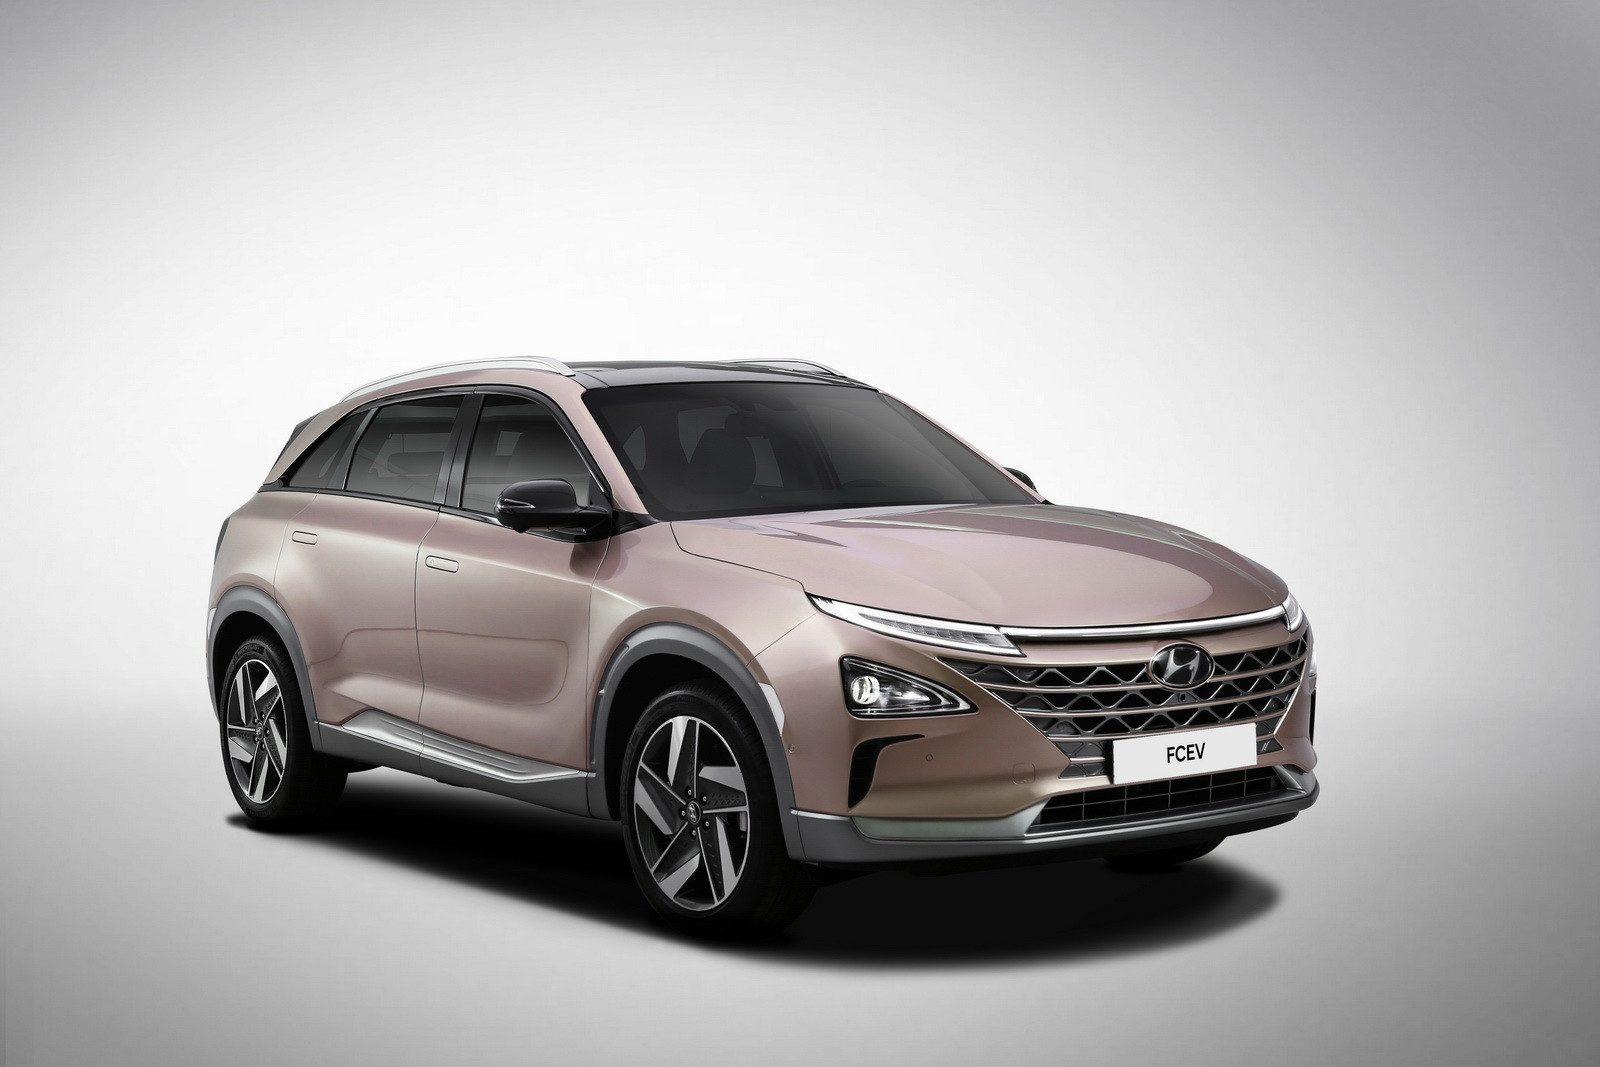 Foto de Hyundai SUV FCEV (1/6)